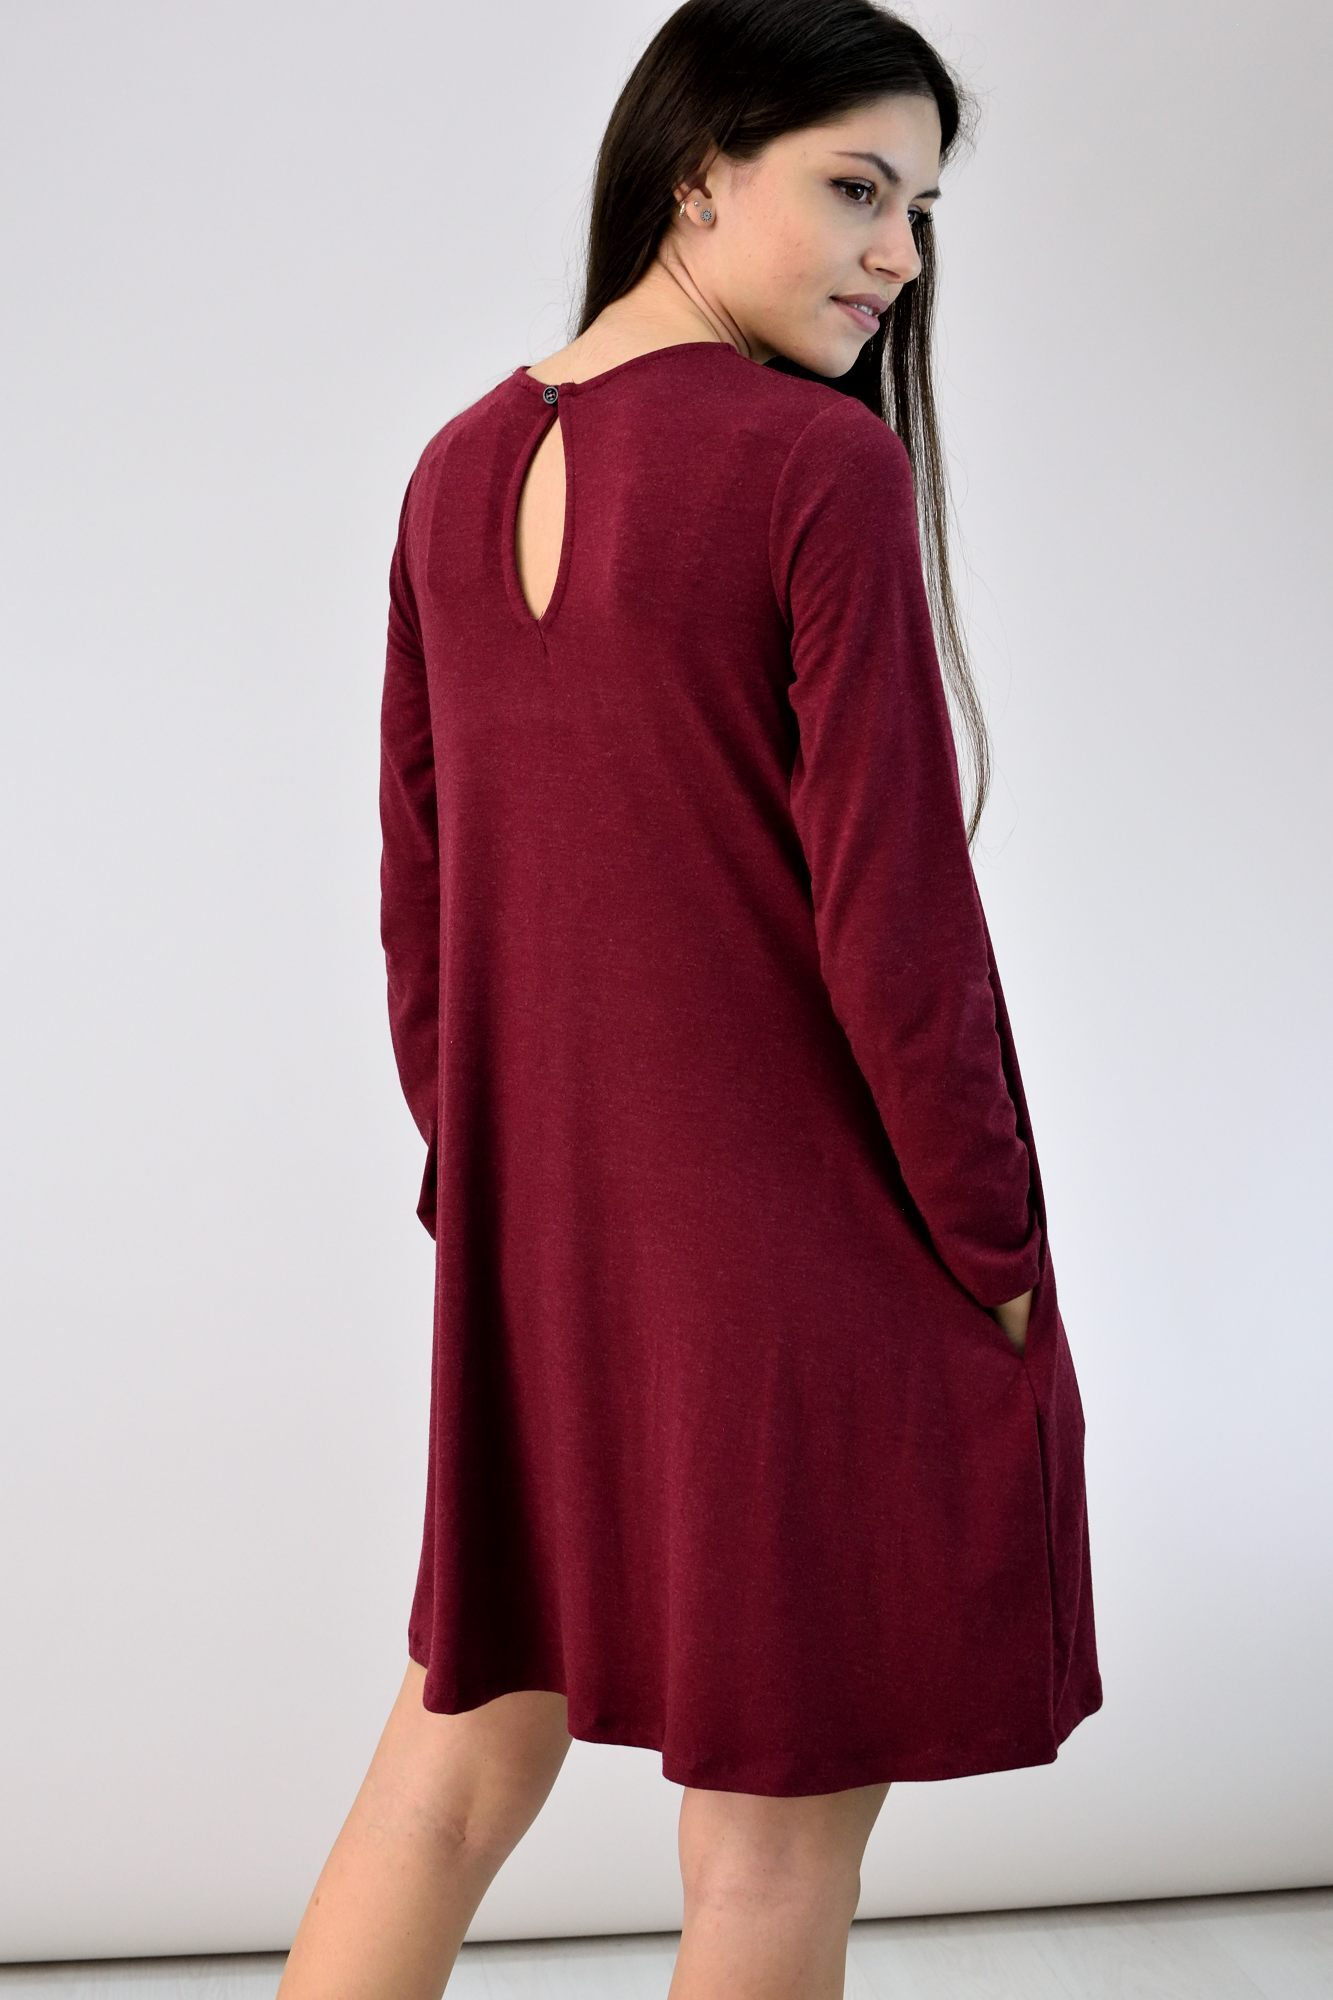 0c409df4740 Κοντό φόρεμα ριχτό. Touch to zoom